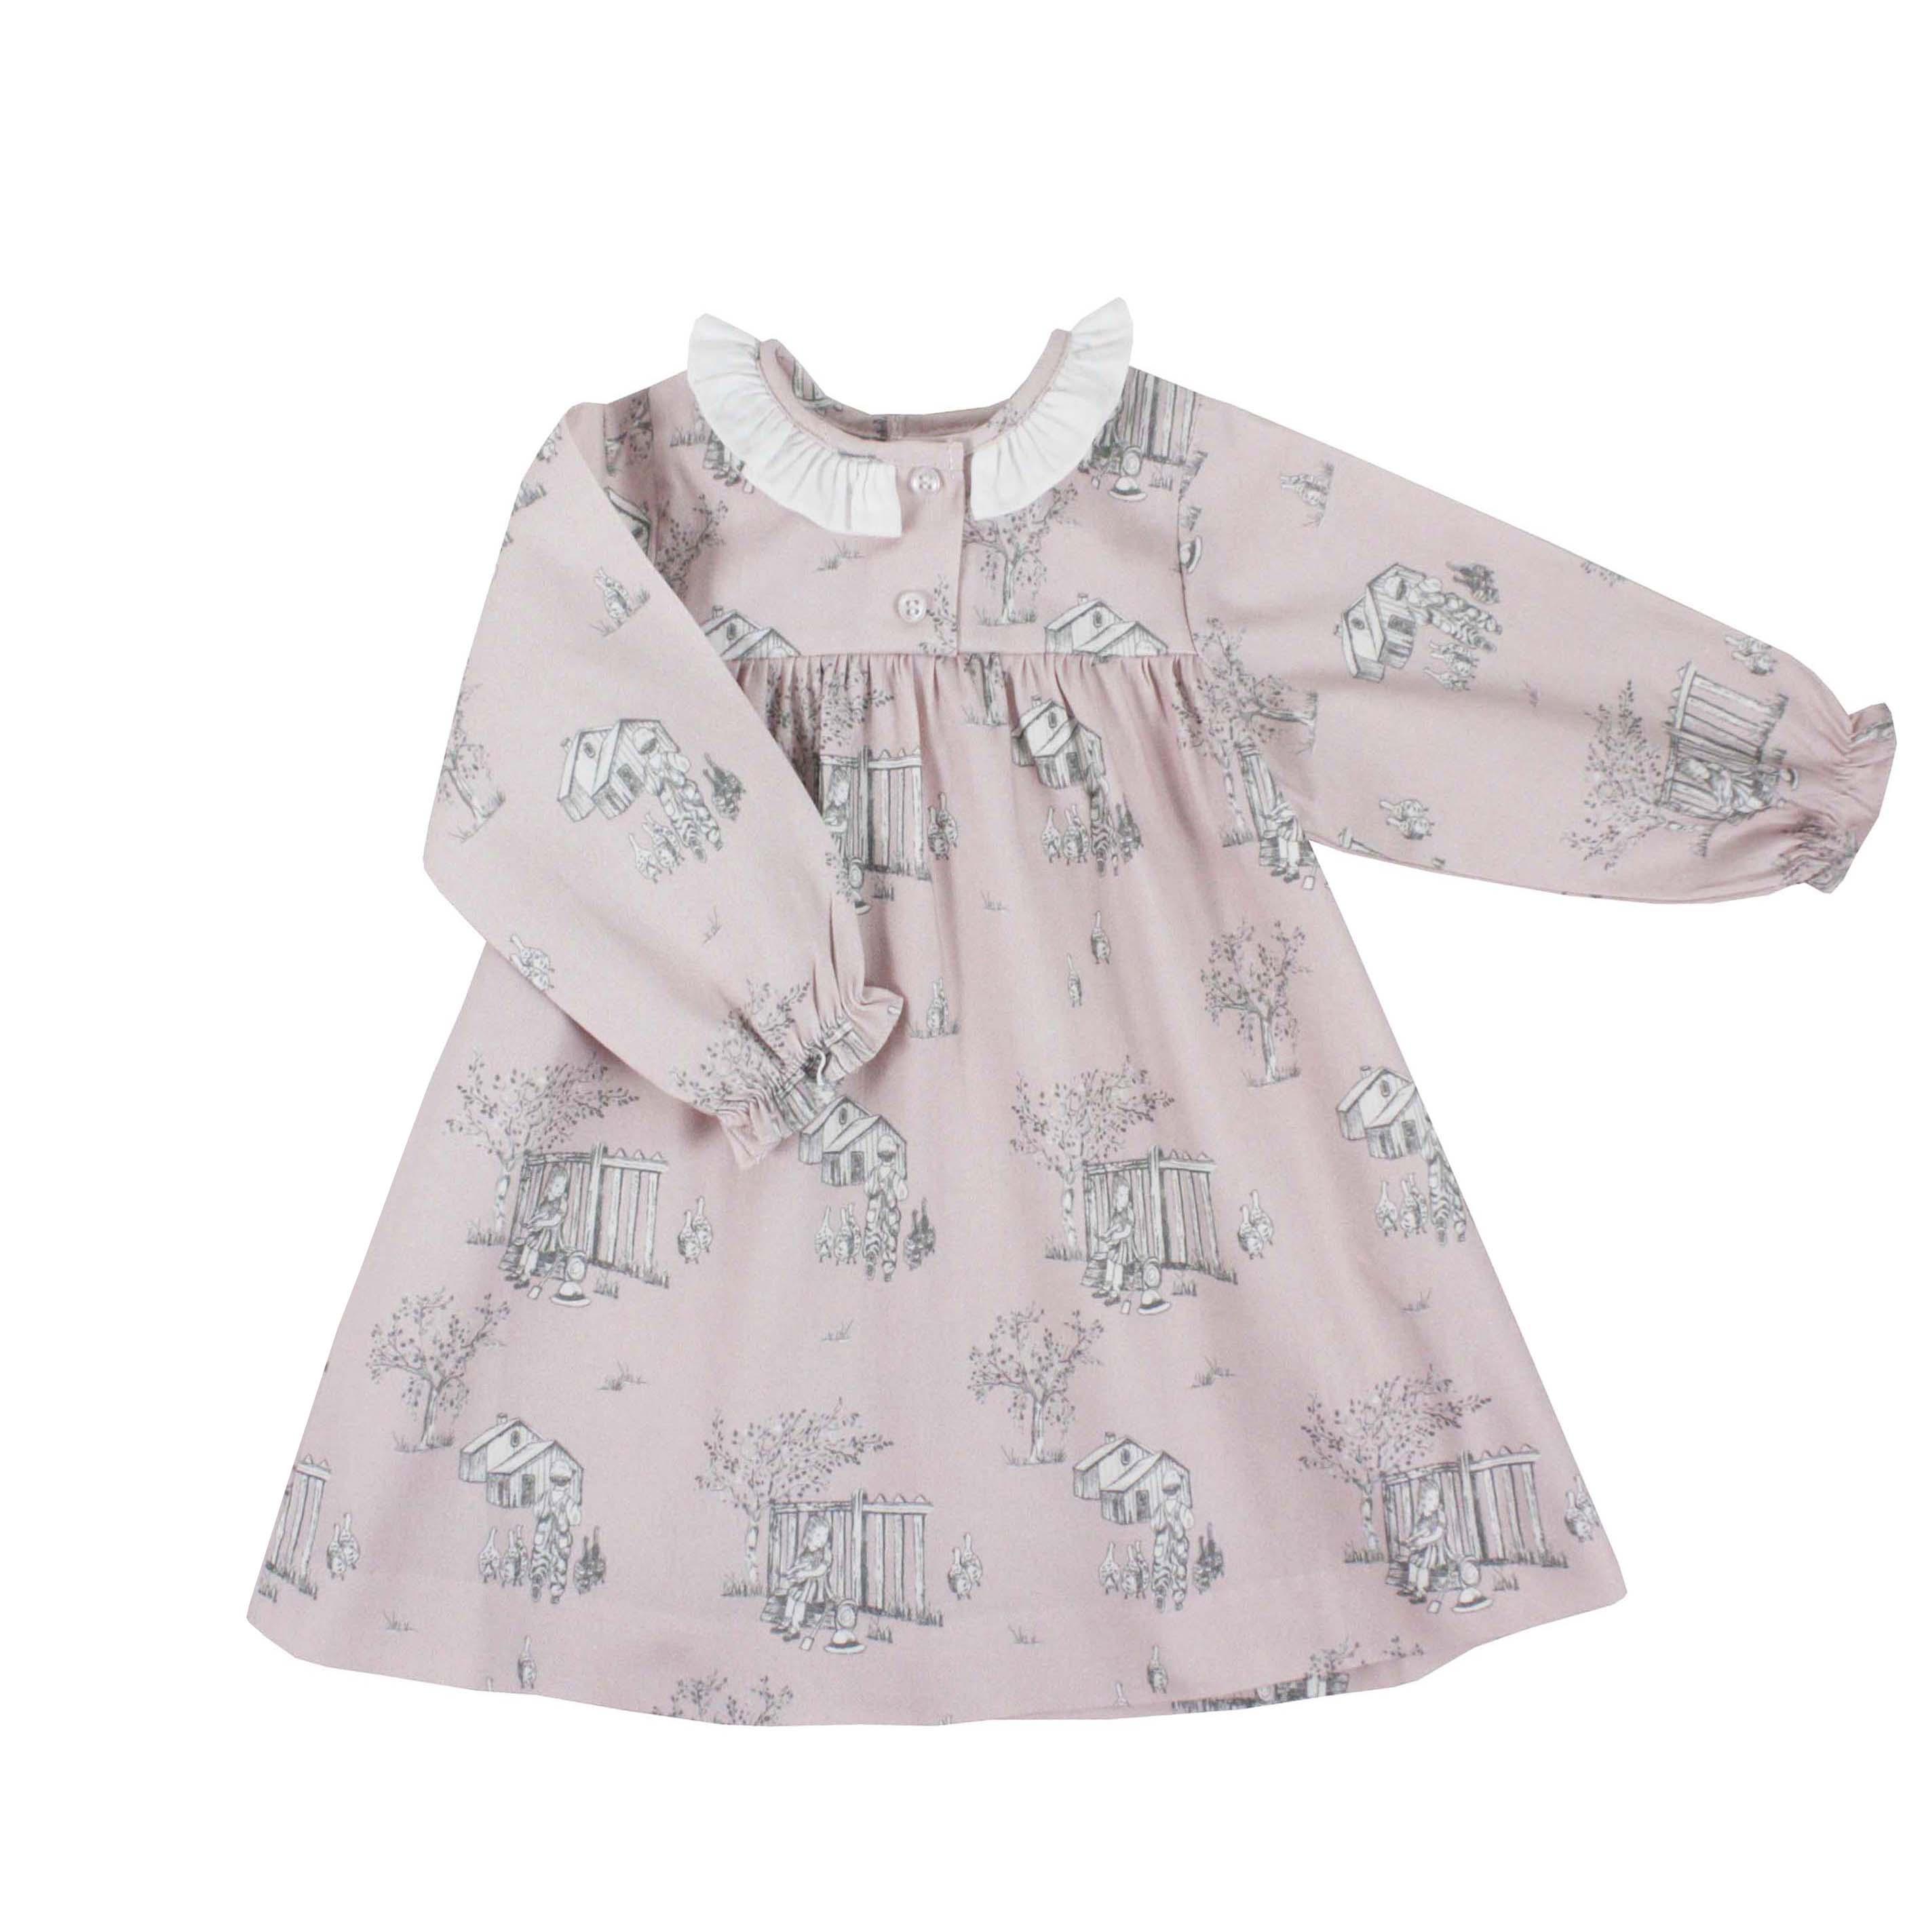 Toddler Girl Dress Pink Toile Long Sleeve Valeria Dress